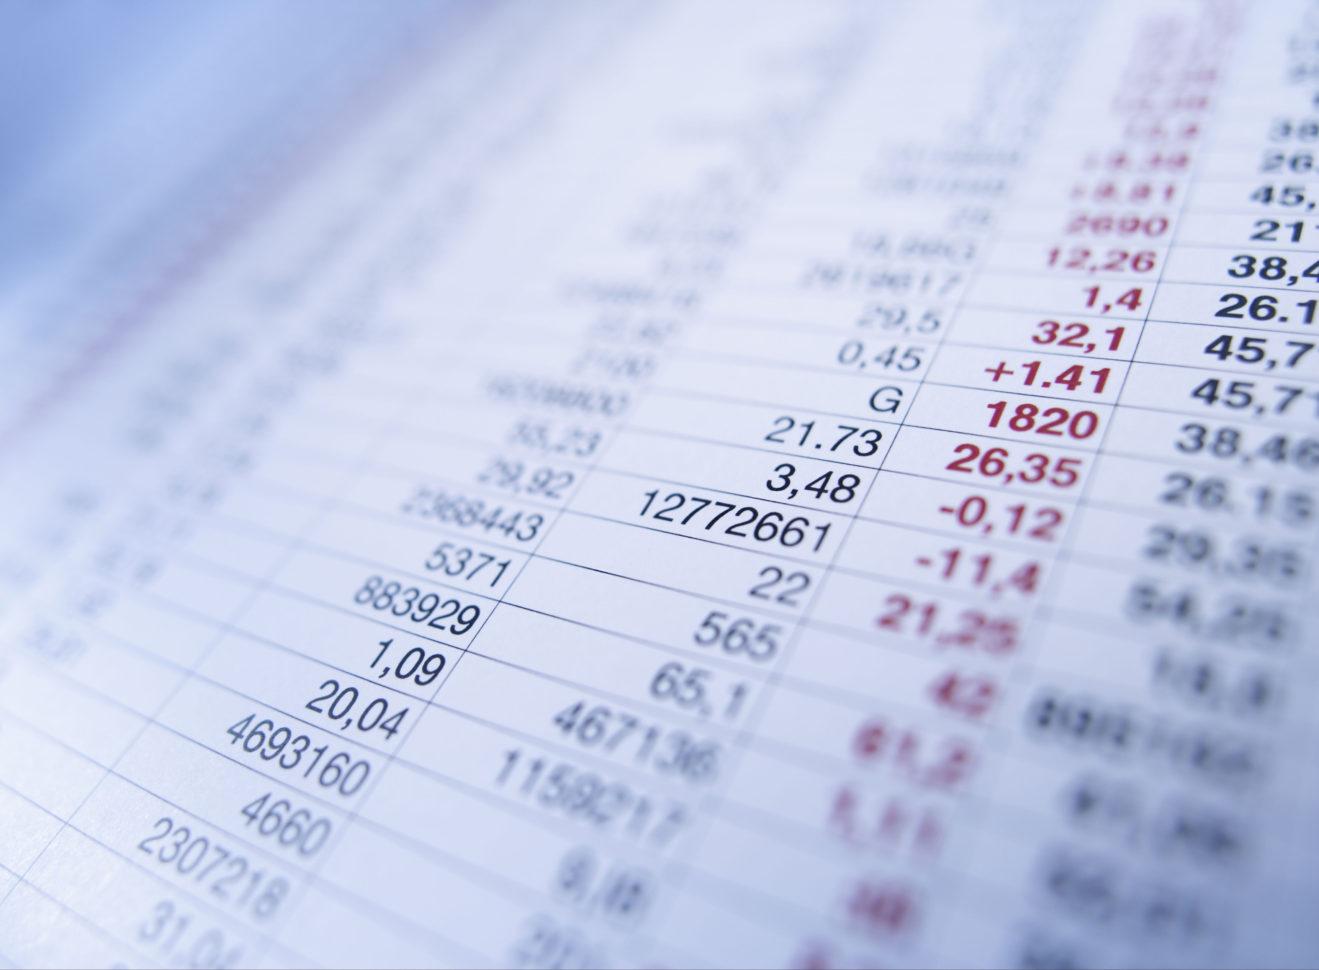 Microsoft Spreadsheet Program Throughout 5 Free Spreadsheet Programs